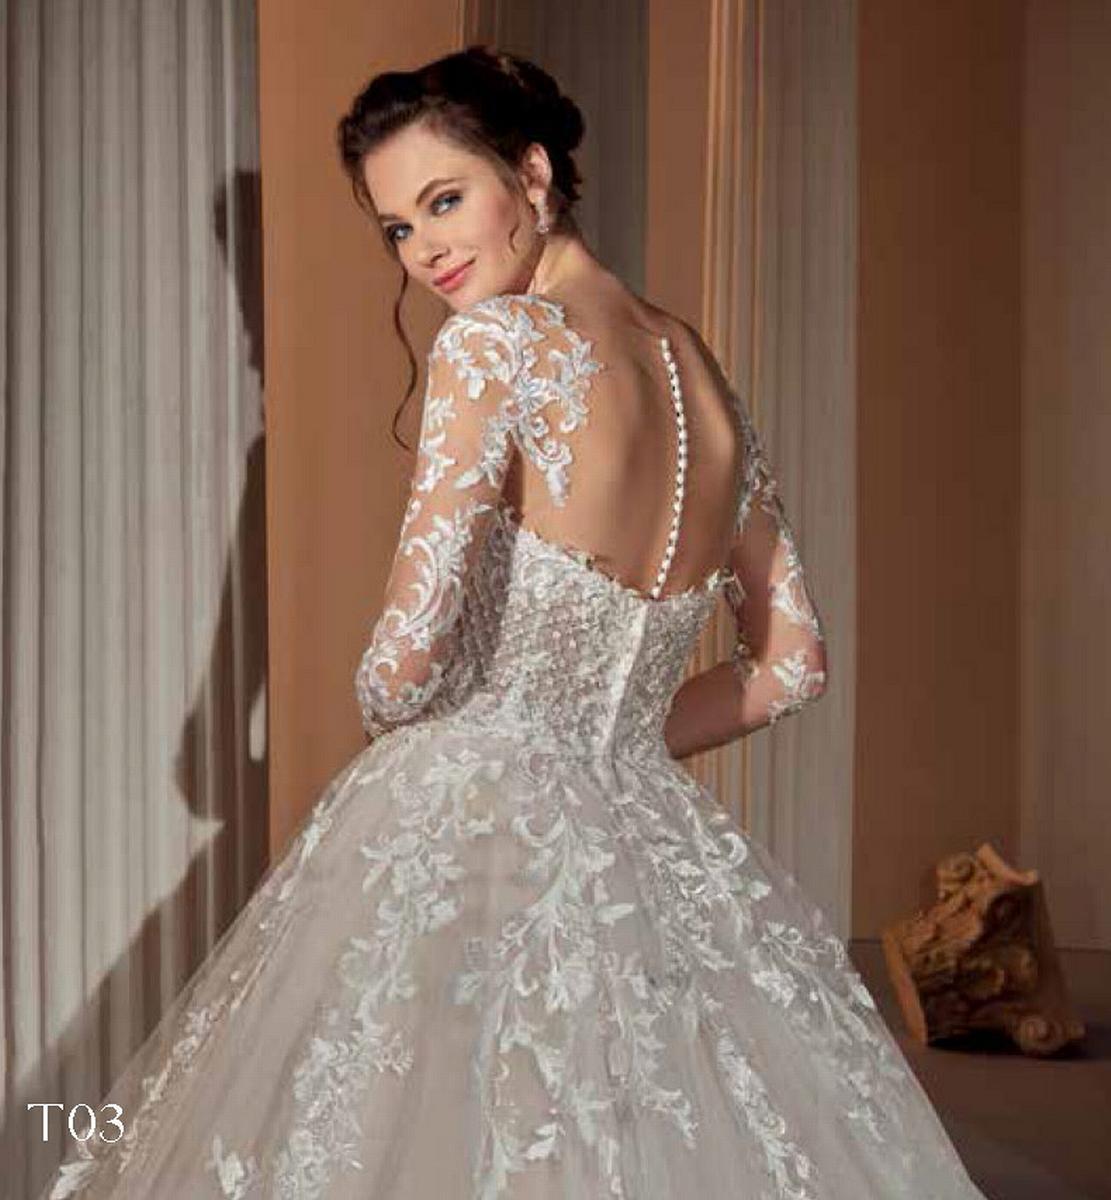 celli-spose-sposa-2022_DEMETRIOS-SPIRAL-1151-07